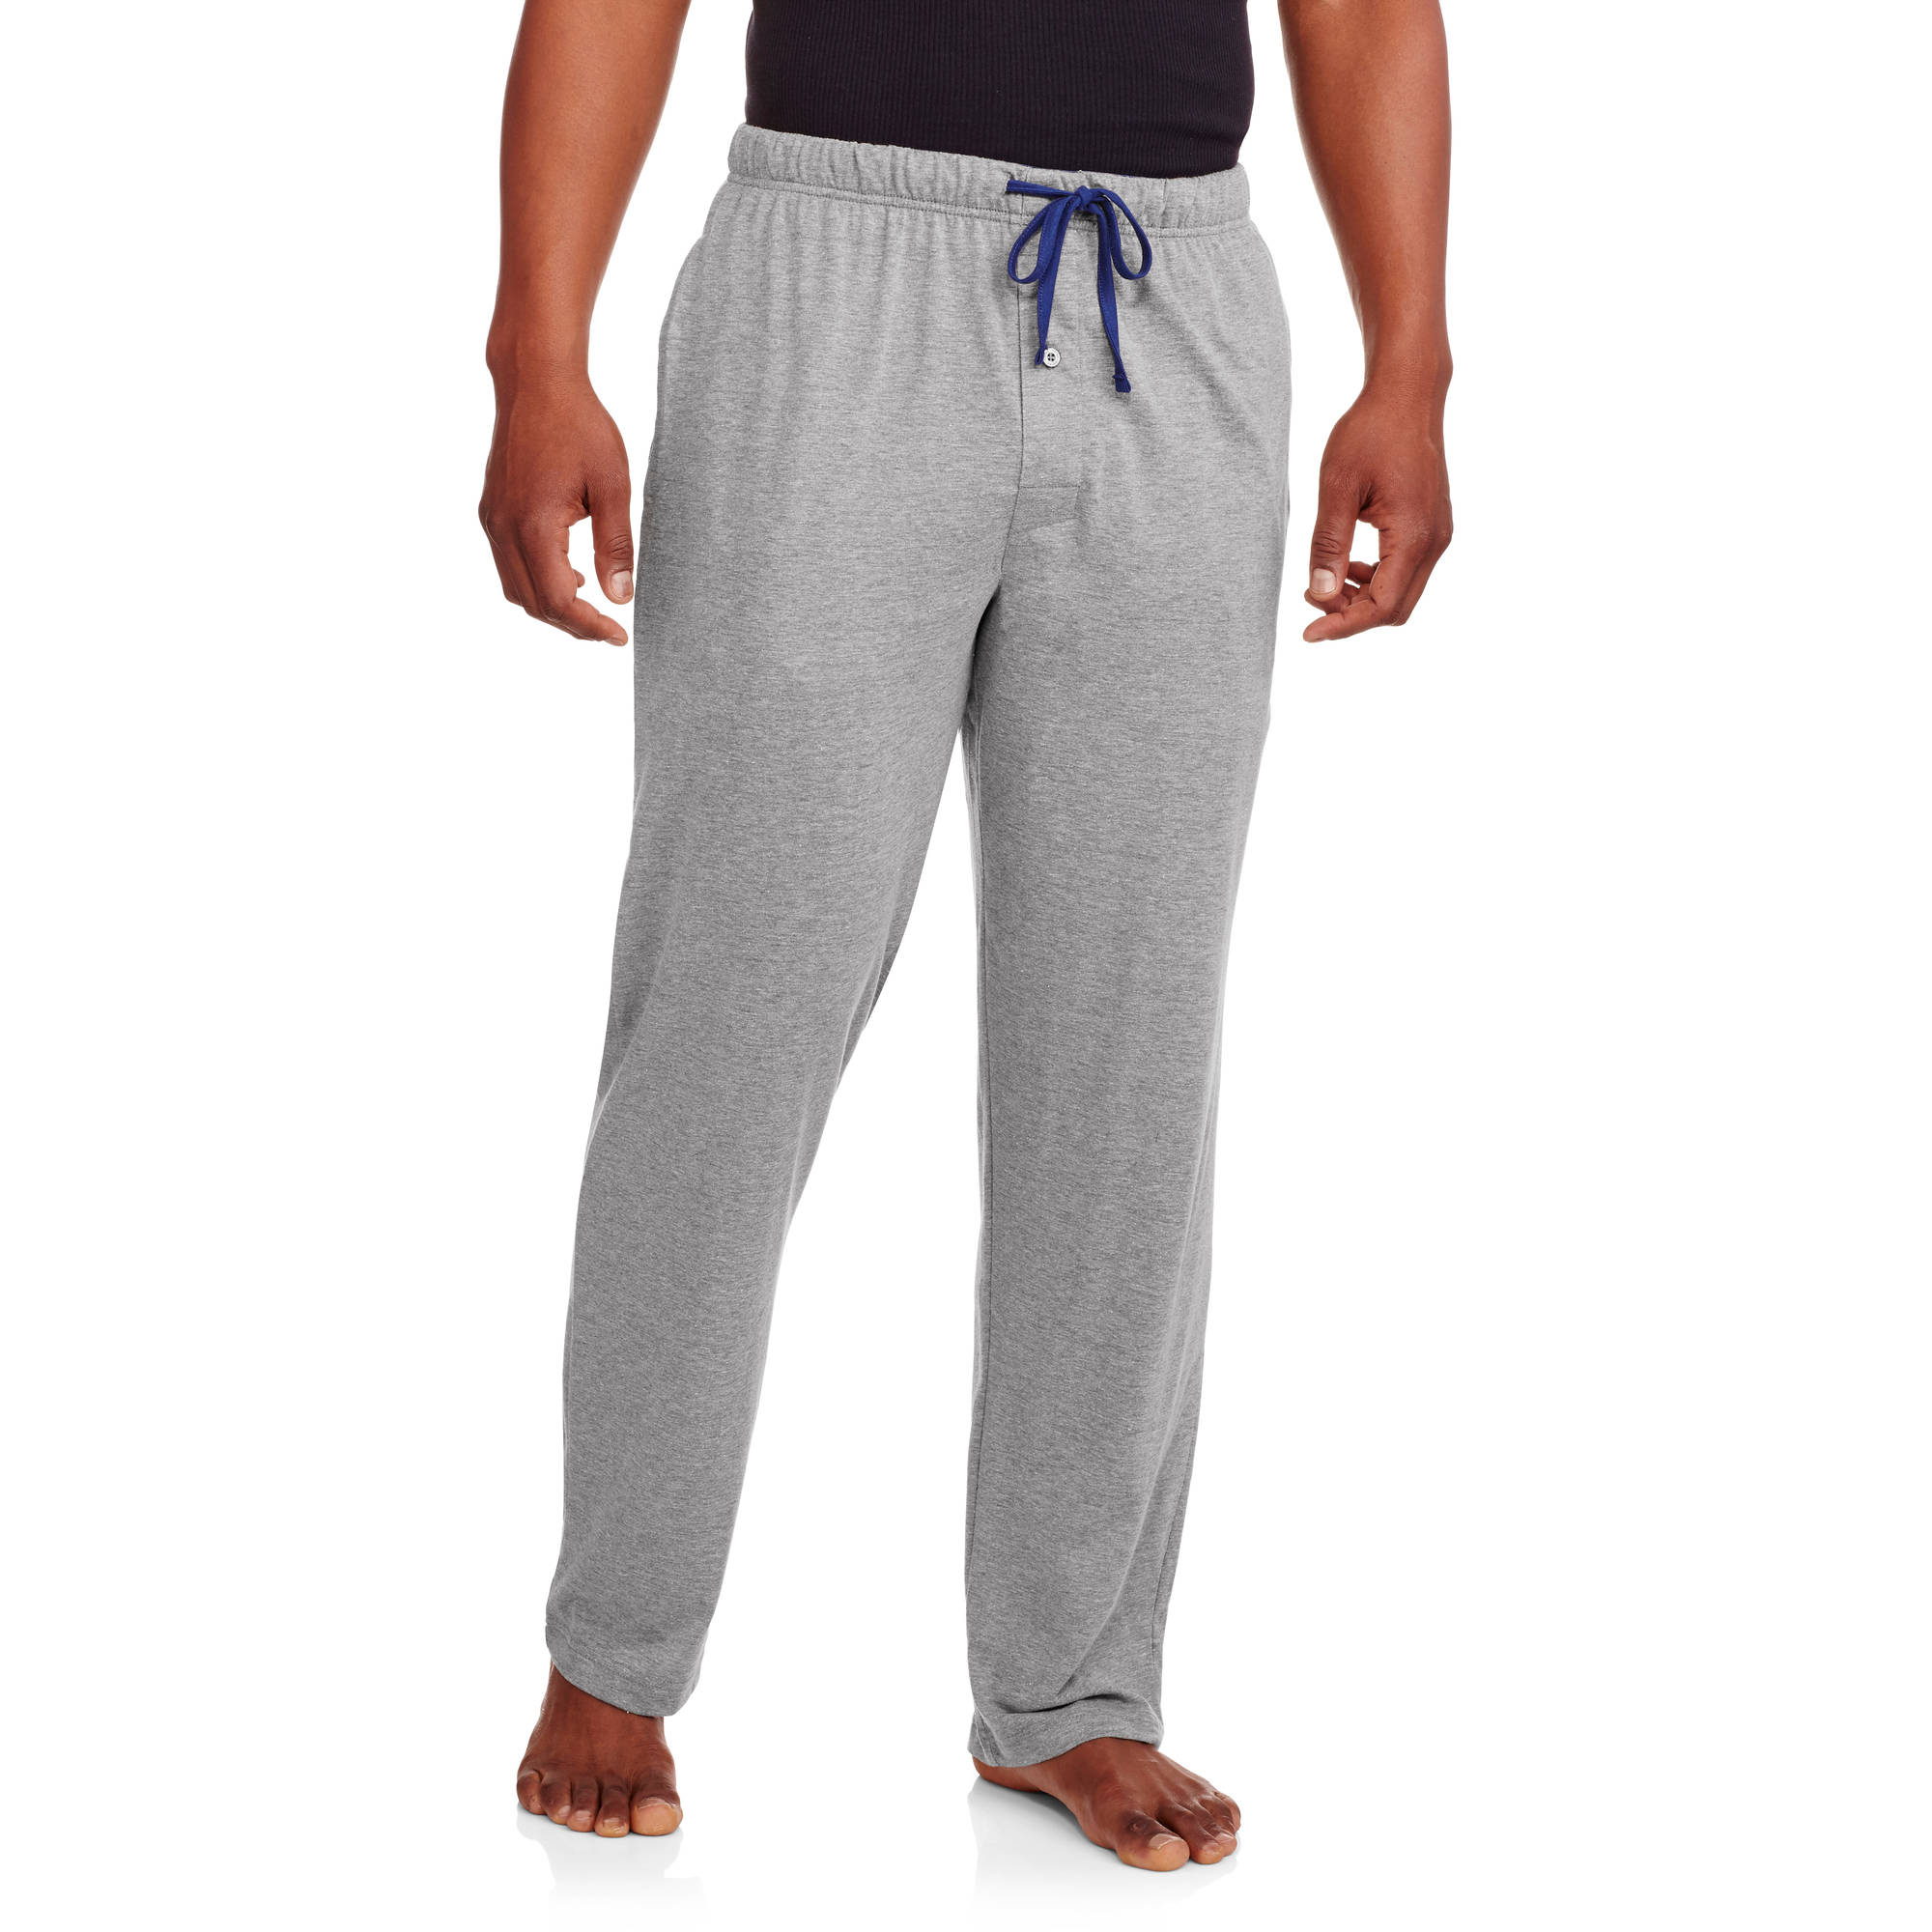 Men's X-Temp Solid Knit Sleep Pant with Hanes Logo Inside Elastic